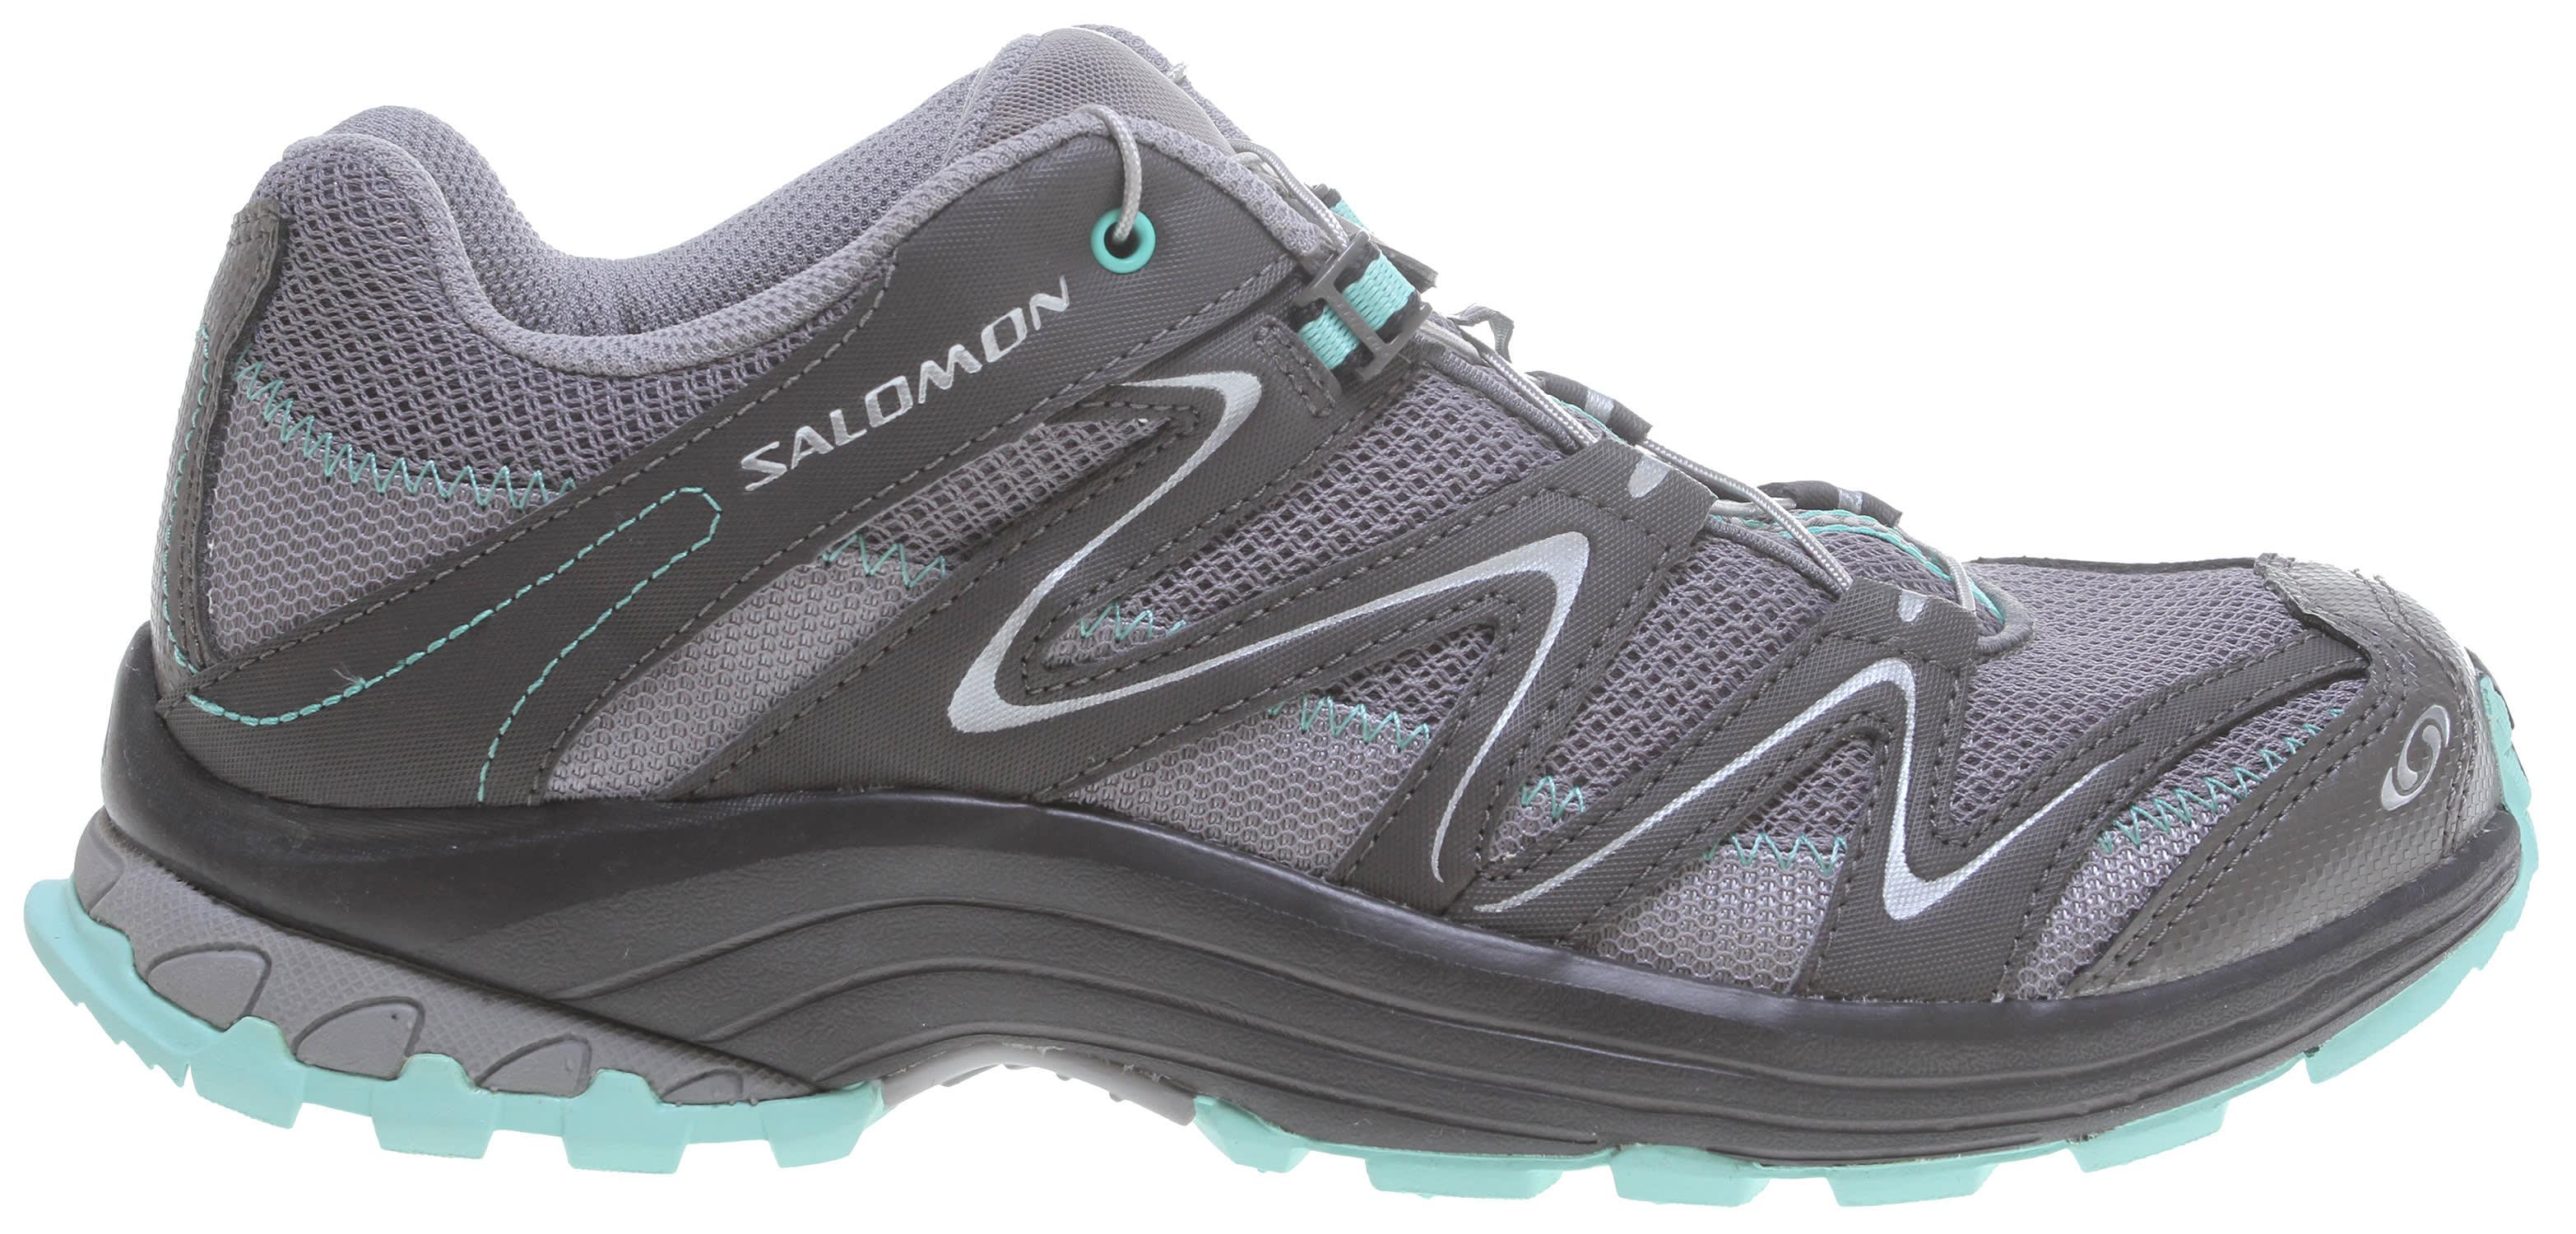 Salomon Trail Score Hiking Shoes - Womens